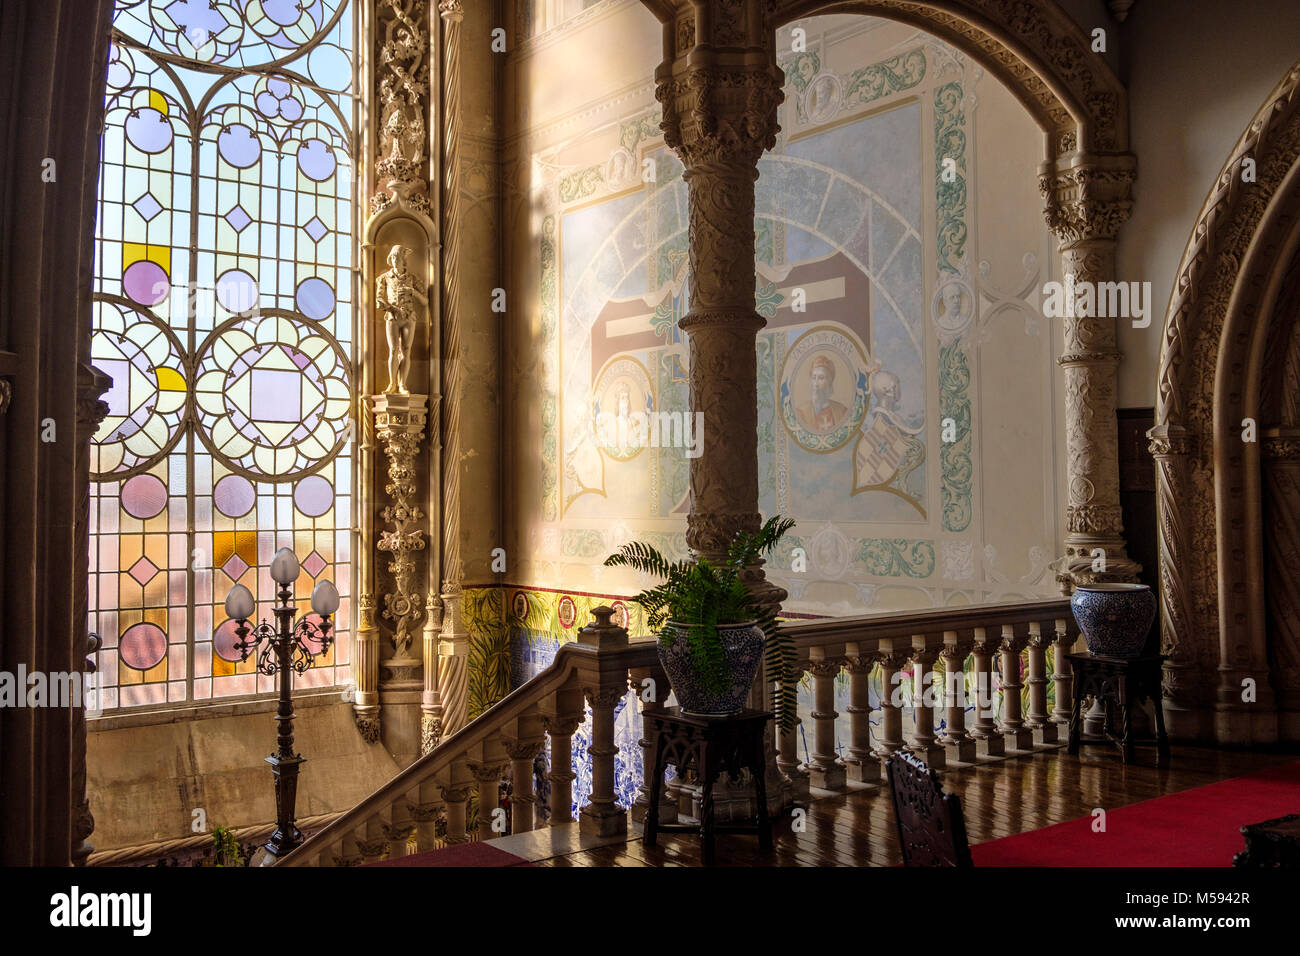 Royal Claremont Hotel London